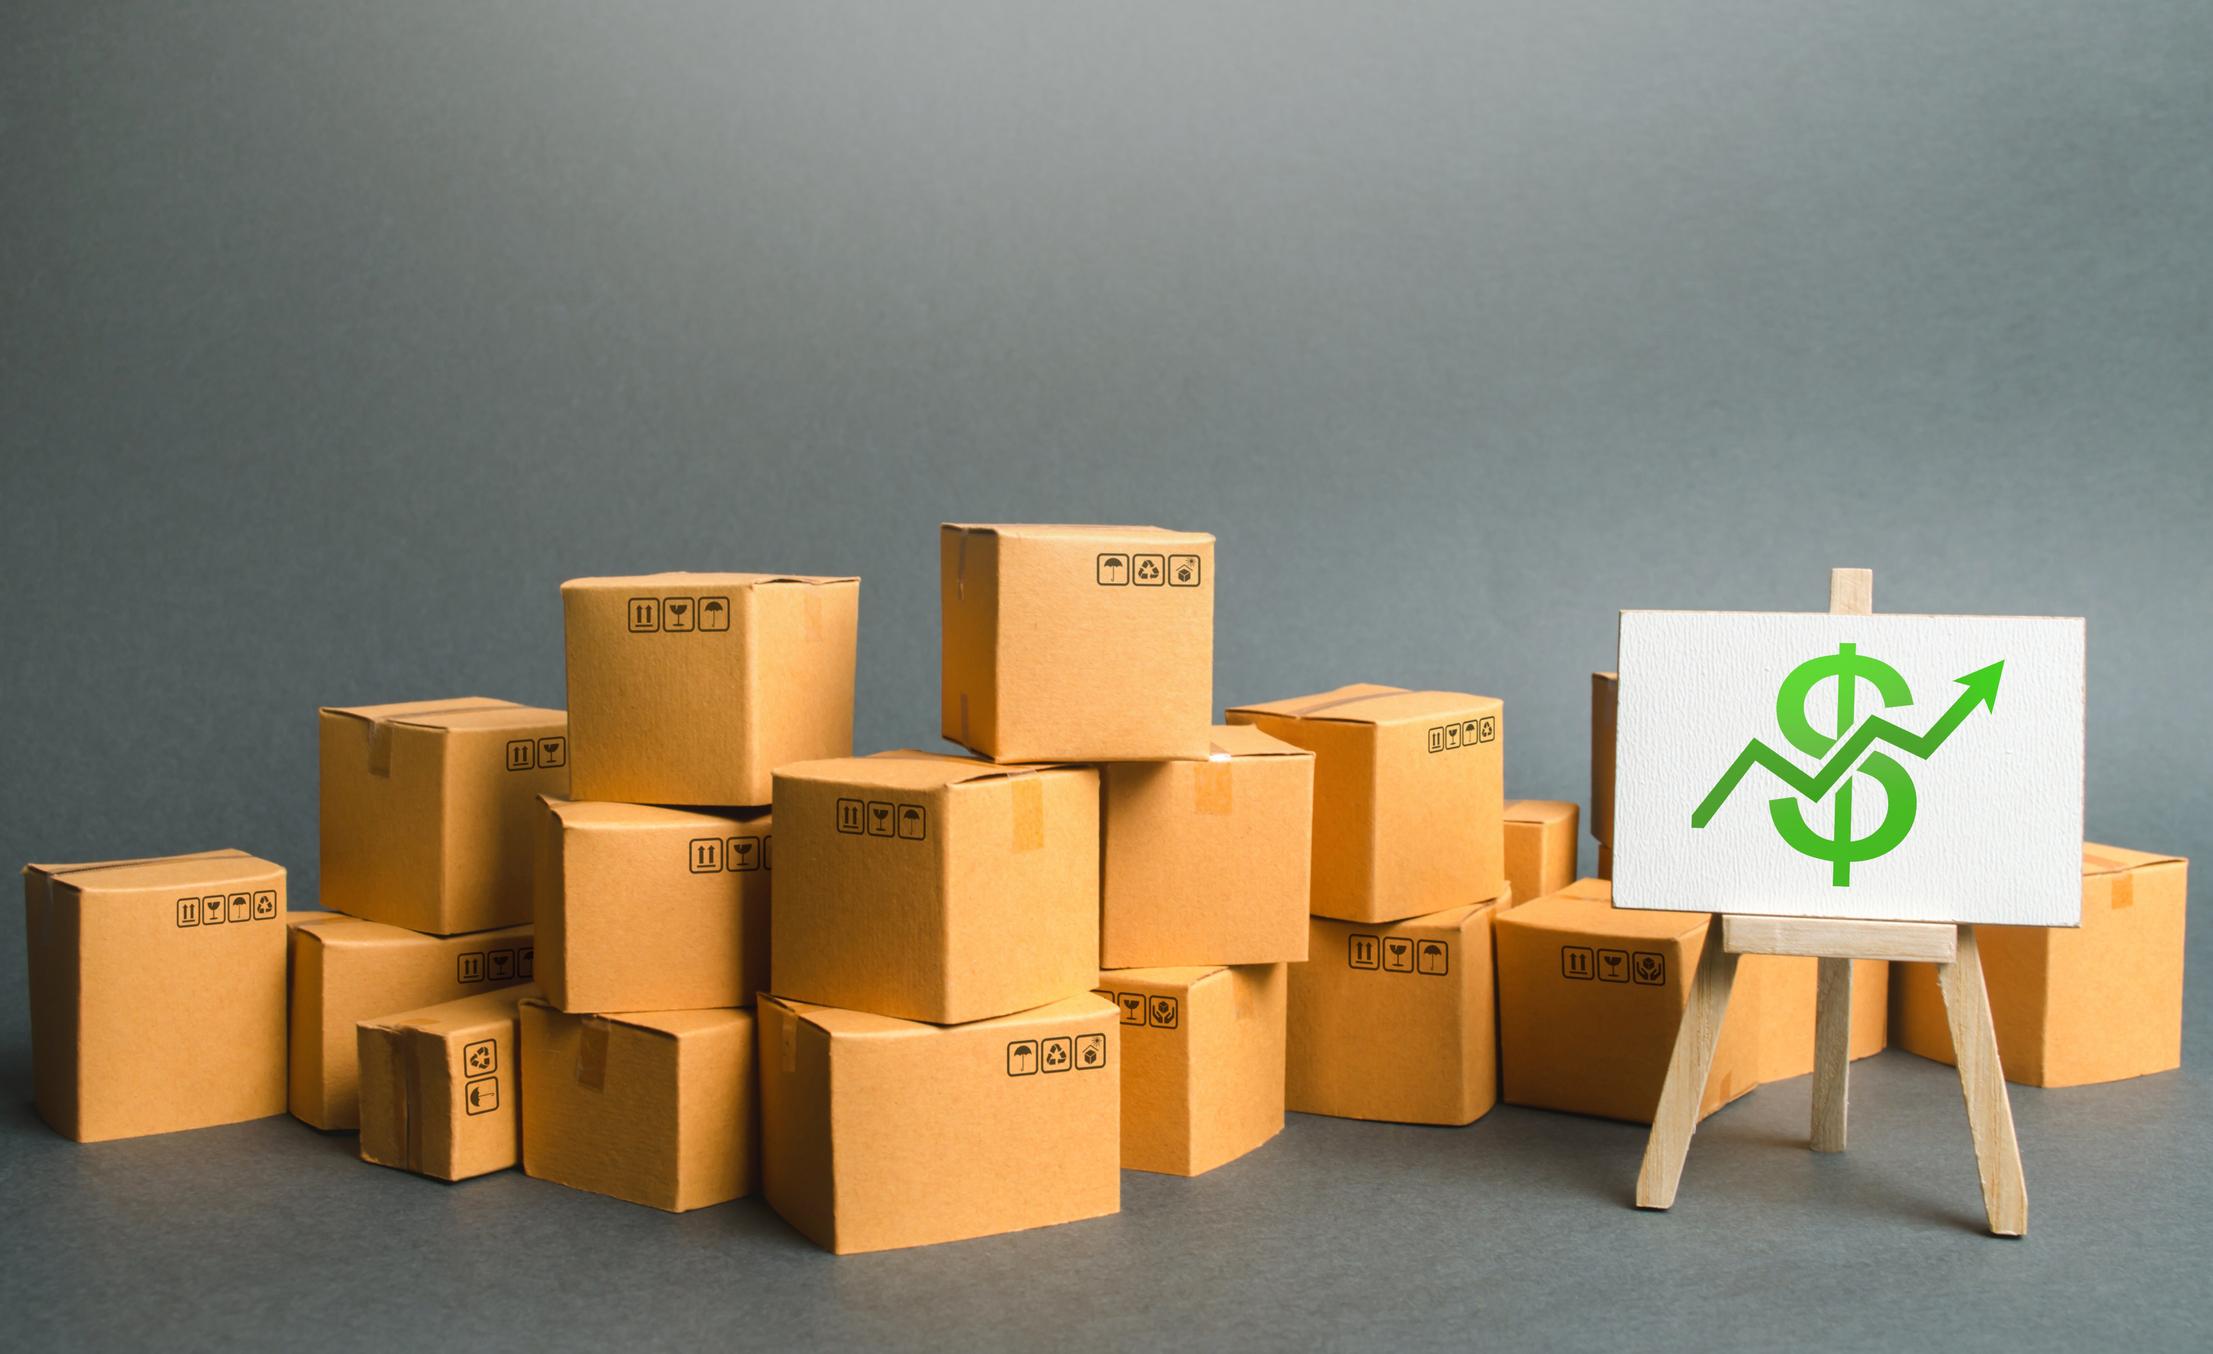 Better Buy: Amazon vs. Dollar General | The Motley Fool